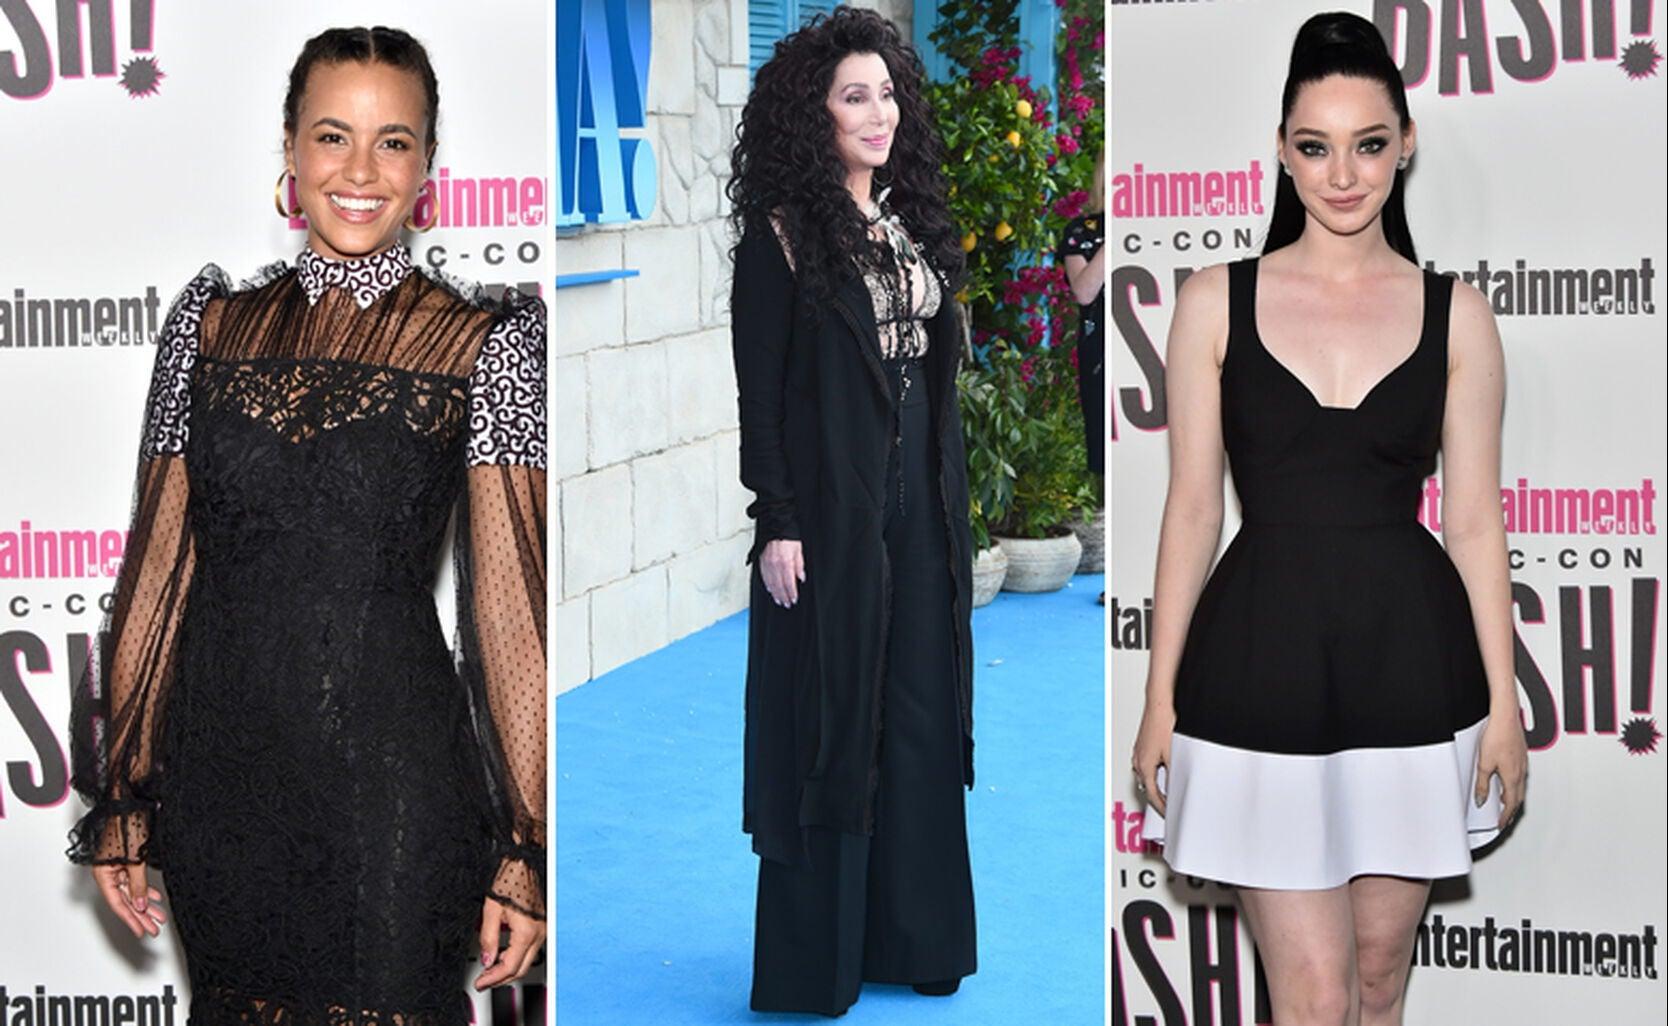 Parisa Fitz-Henley, Cher and Emma Dumont